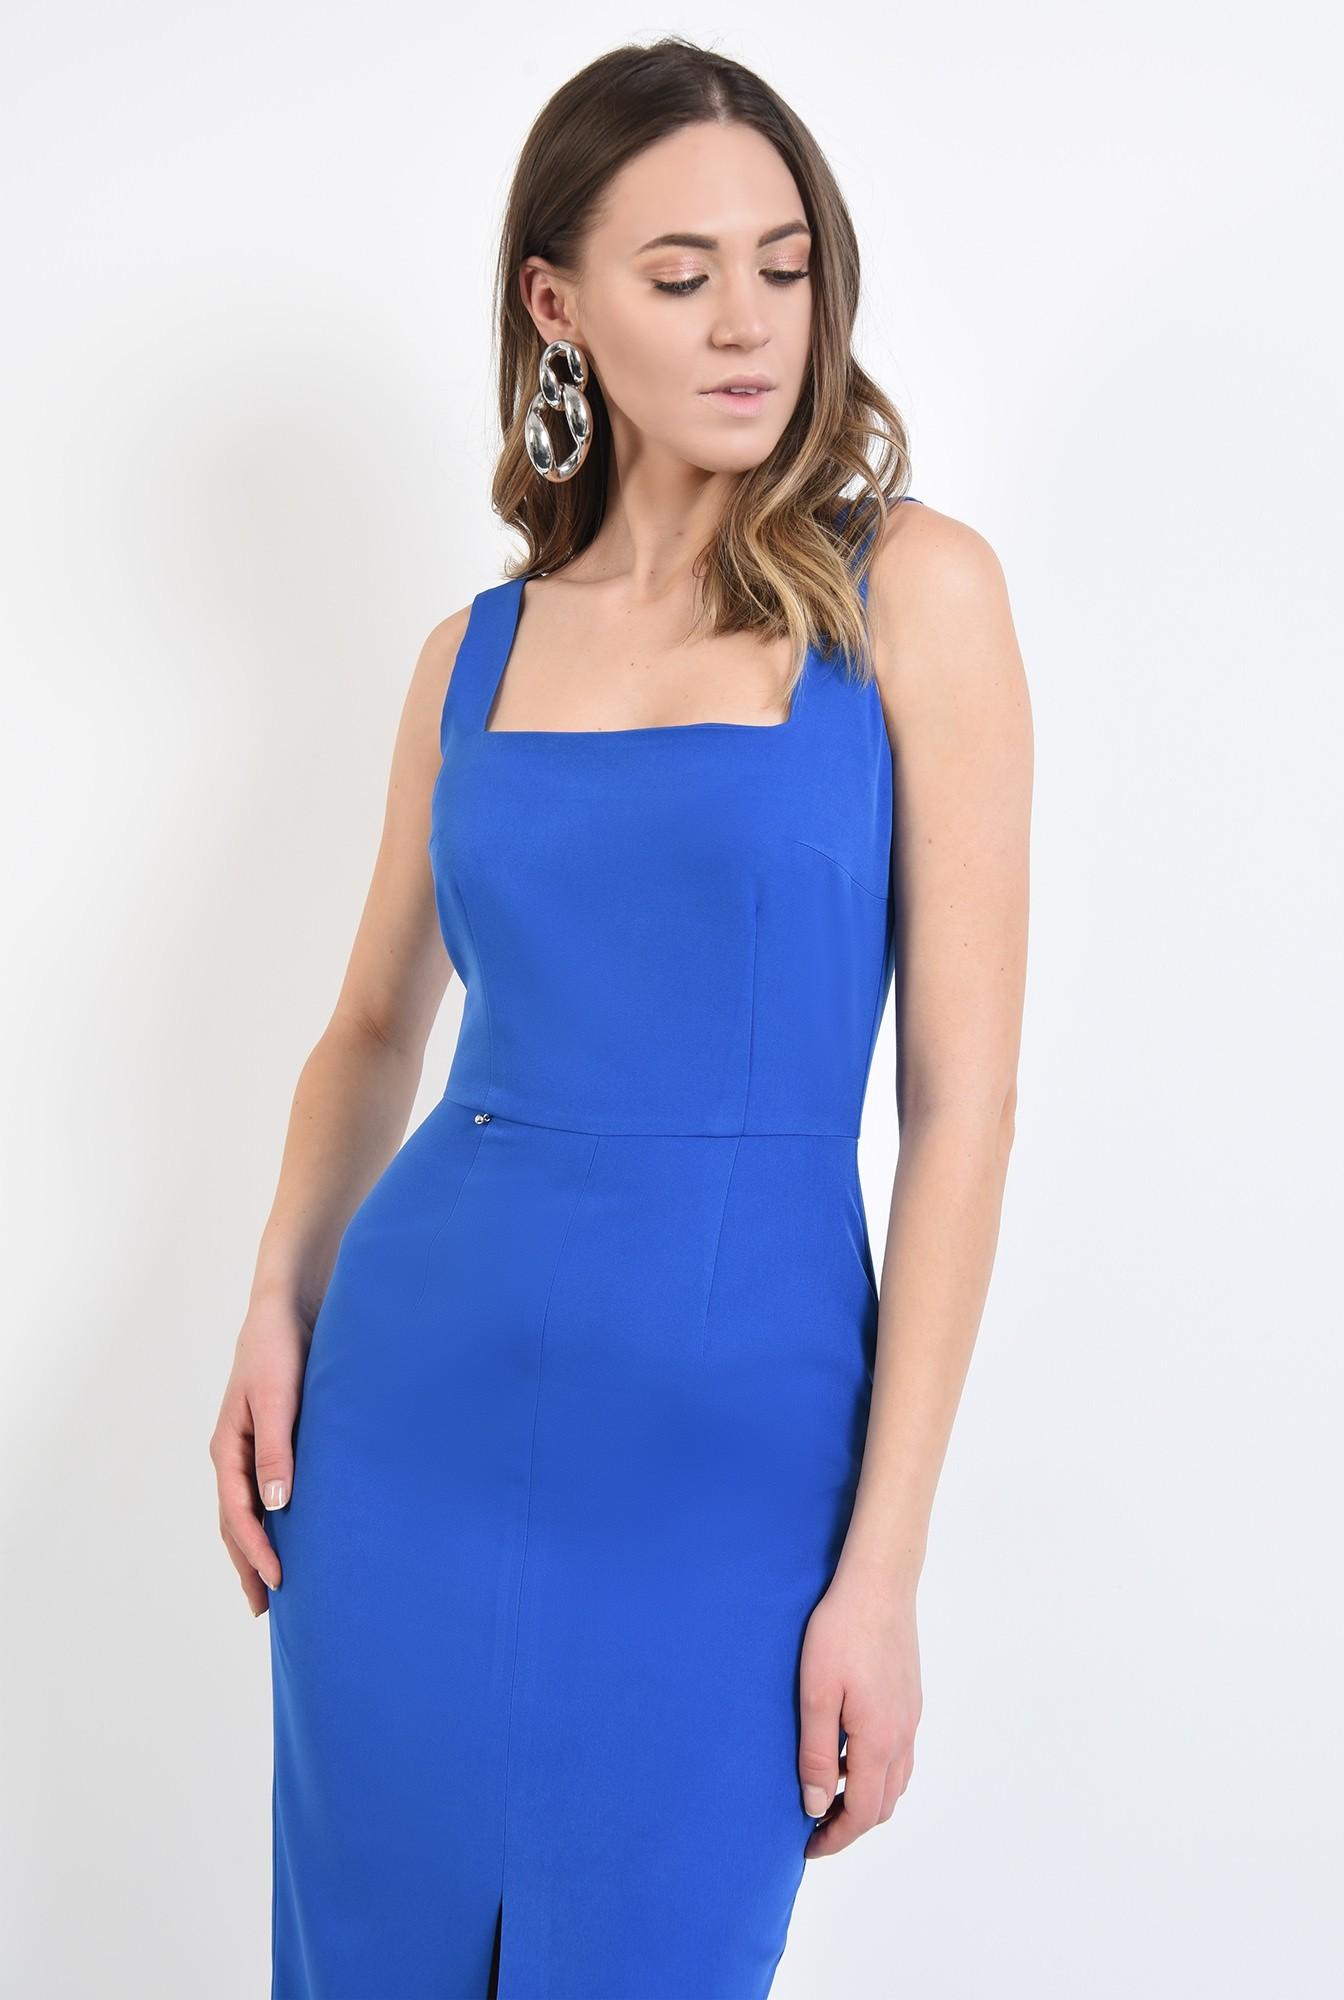 2 - 360 - rochie albastra, cu bretele, de ocazie, cu decolteu